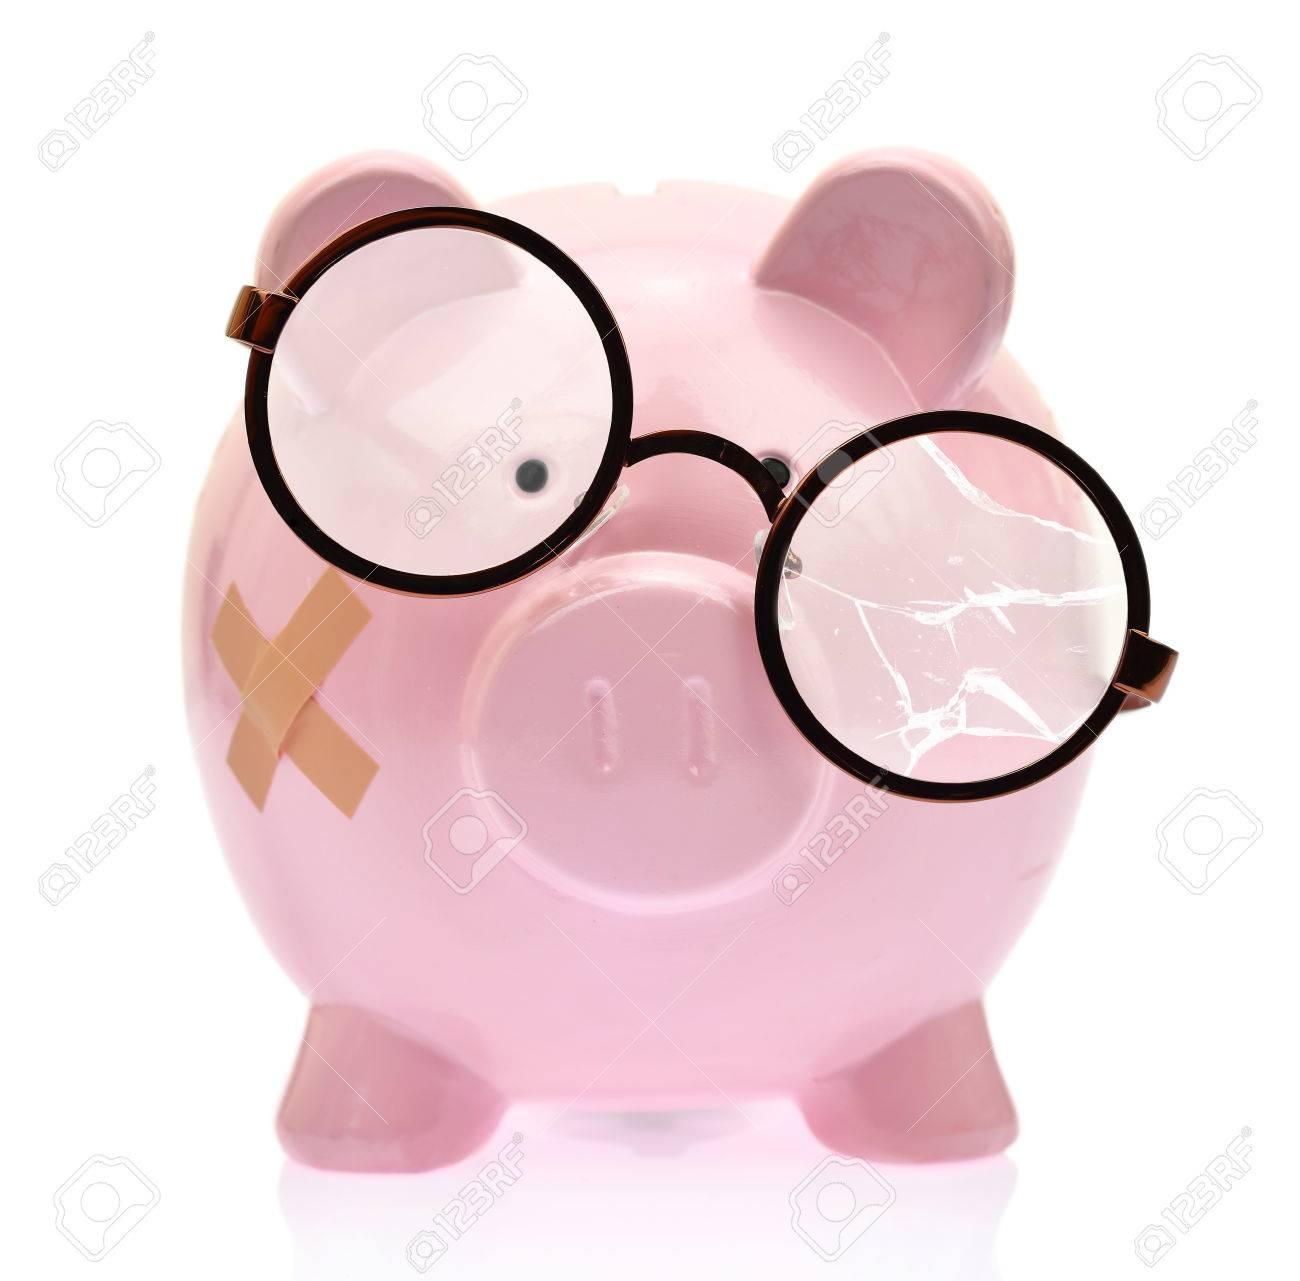 Piggy bank with broken eyeglasses and bandage Stock Photo - 31238576